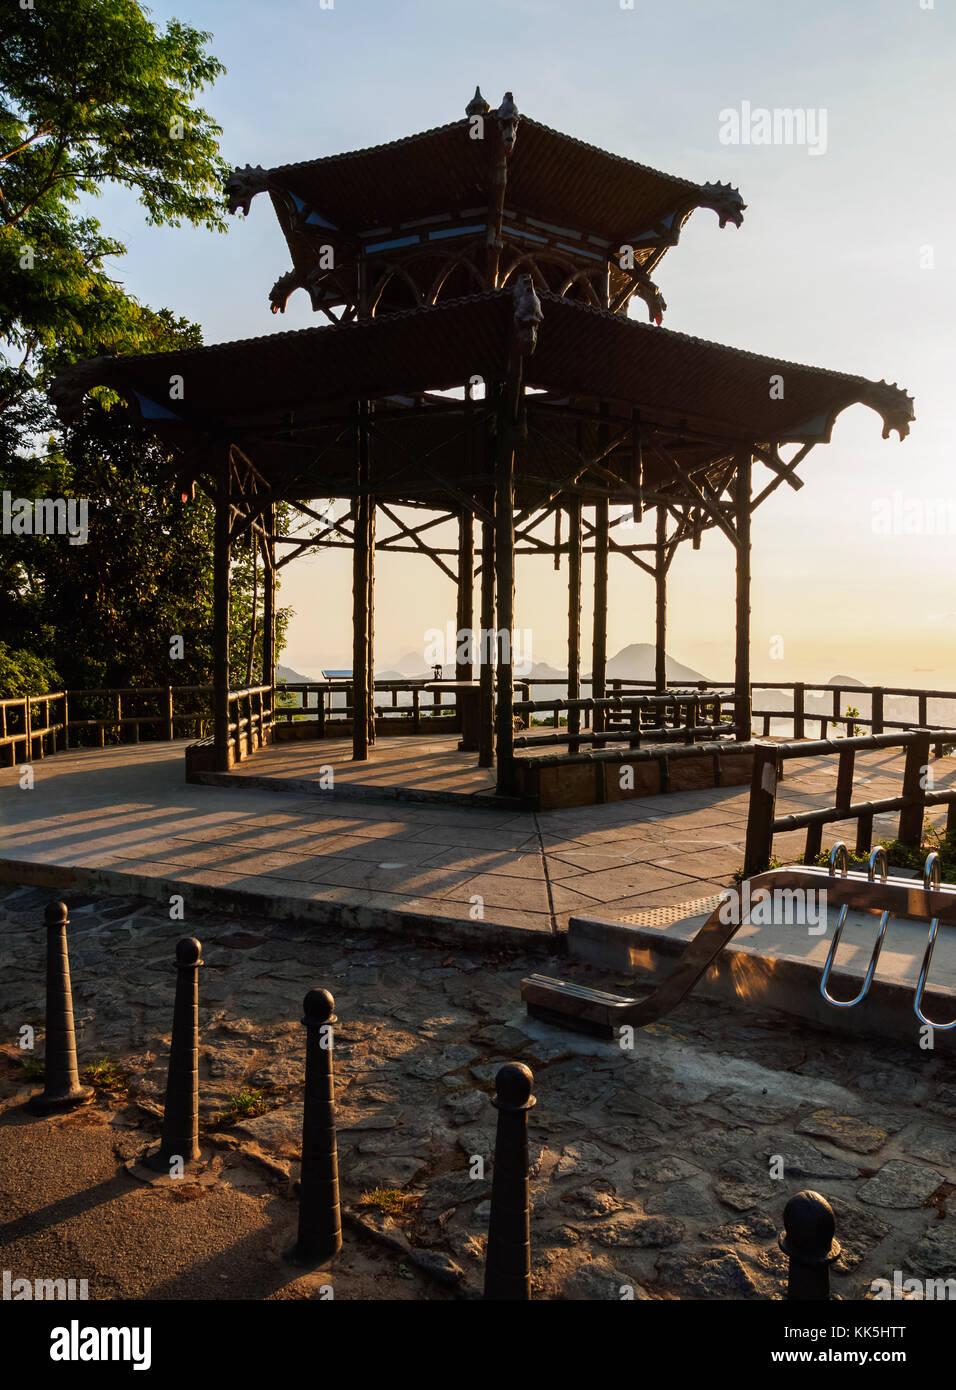 Vista Chinesa, Chinese Belvedere, Tijuca Forest National Park, Rio de Janeiro, Brazil Stock Photo